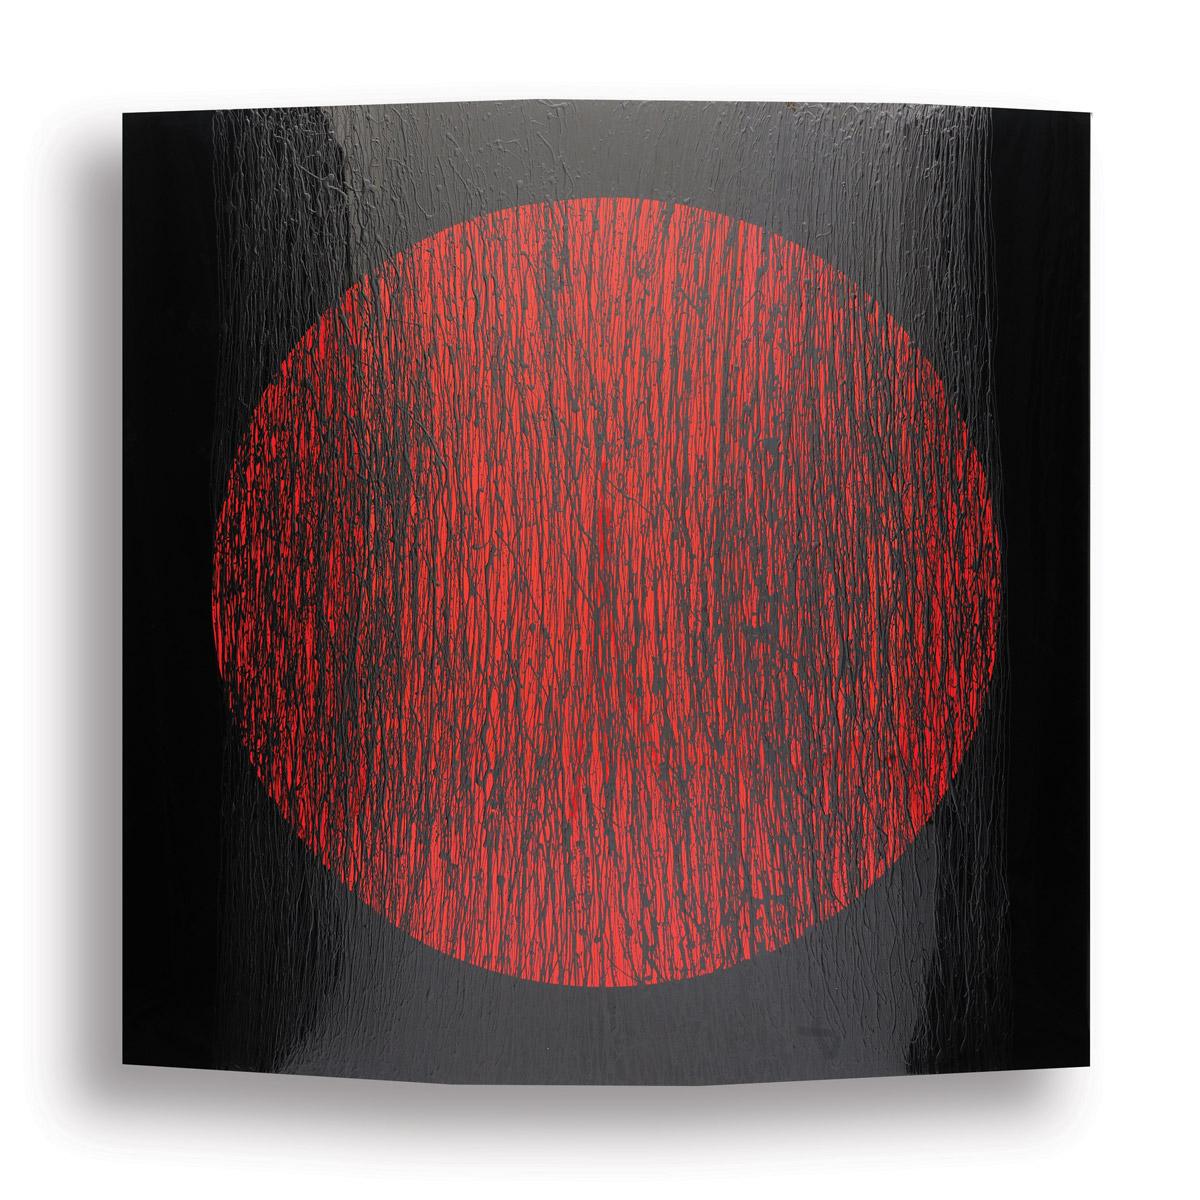 Black-with-Red-Circle_190-x-190-cm_Lacquer-on-aluminum_2010 rashid al khalifa